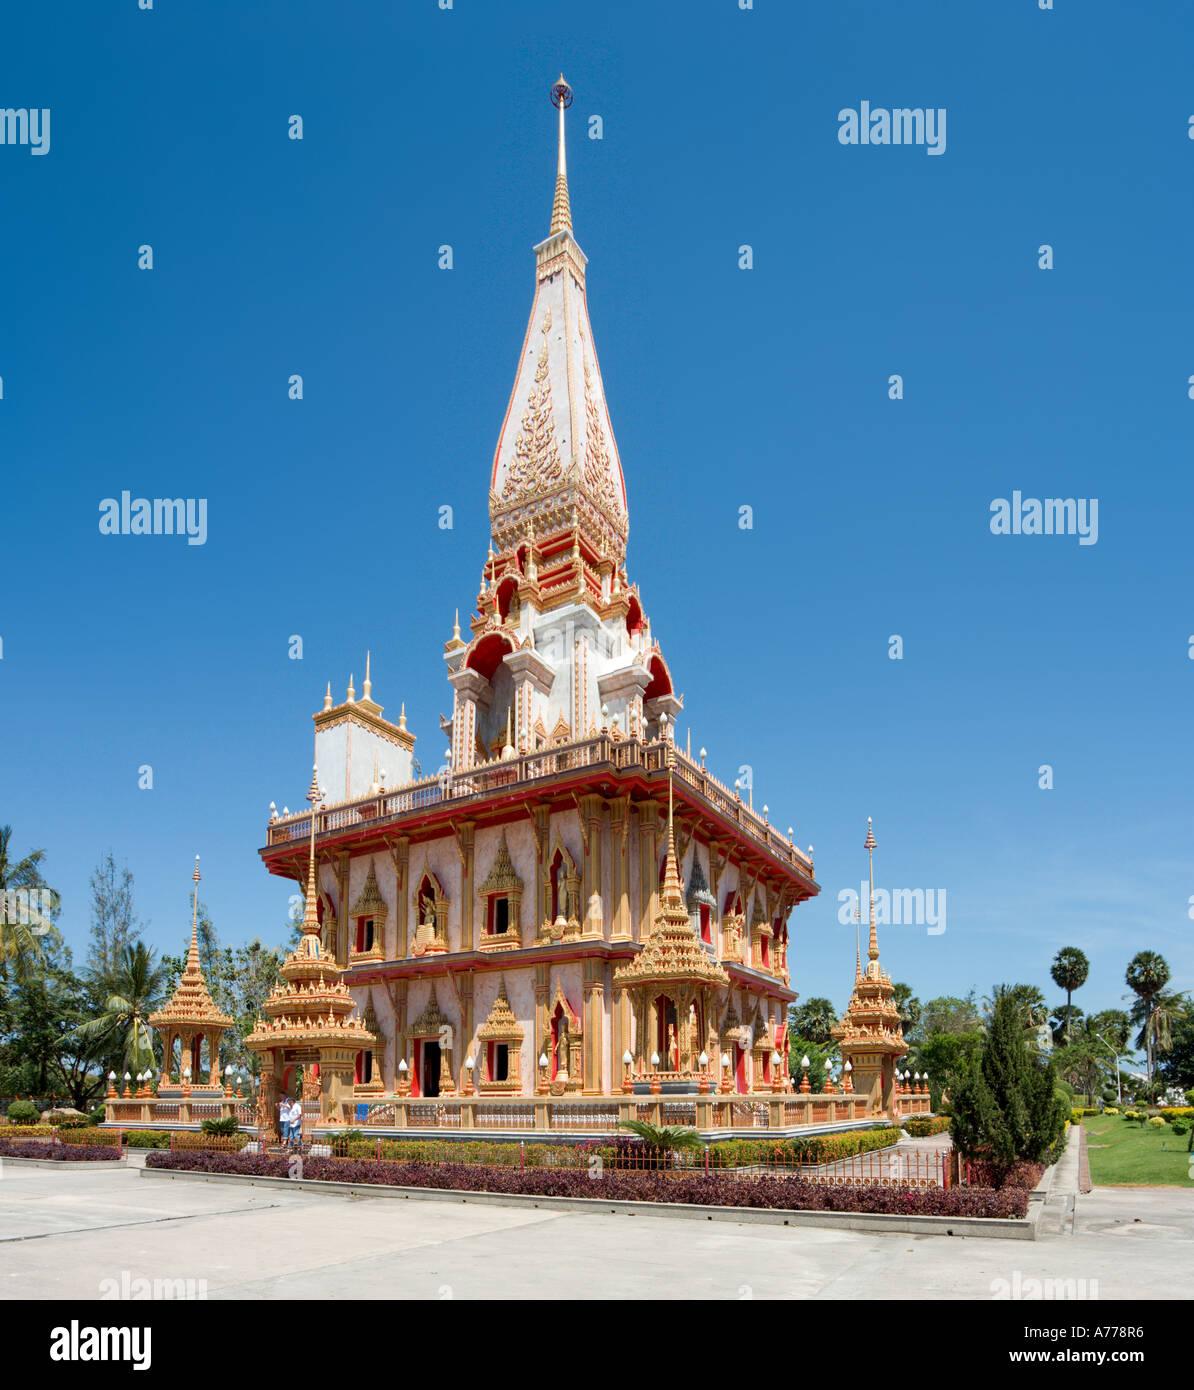 El templo budista Wat Chalong, Phuket, Tailandia Foto de stock